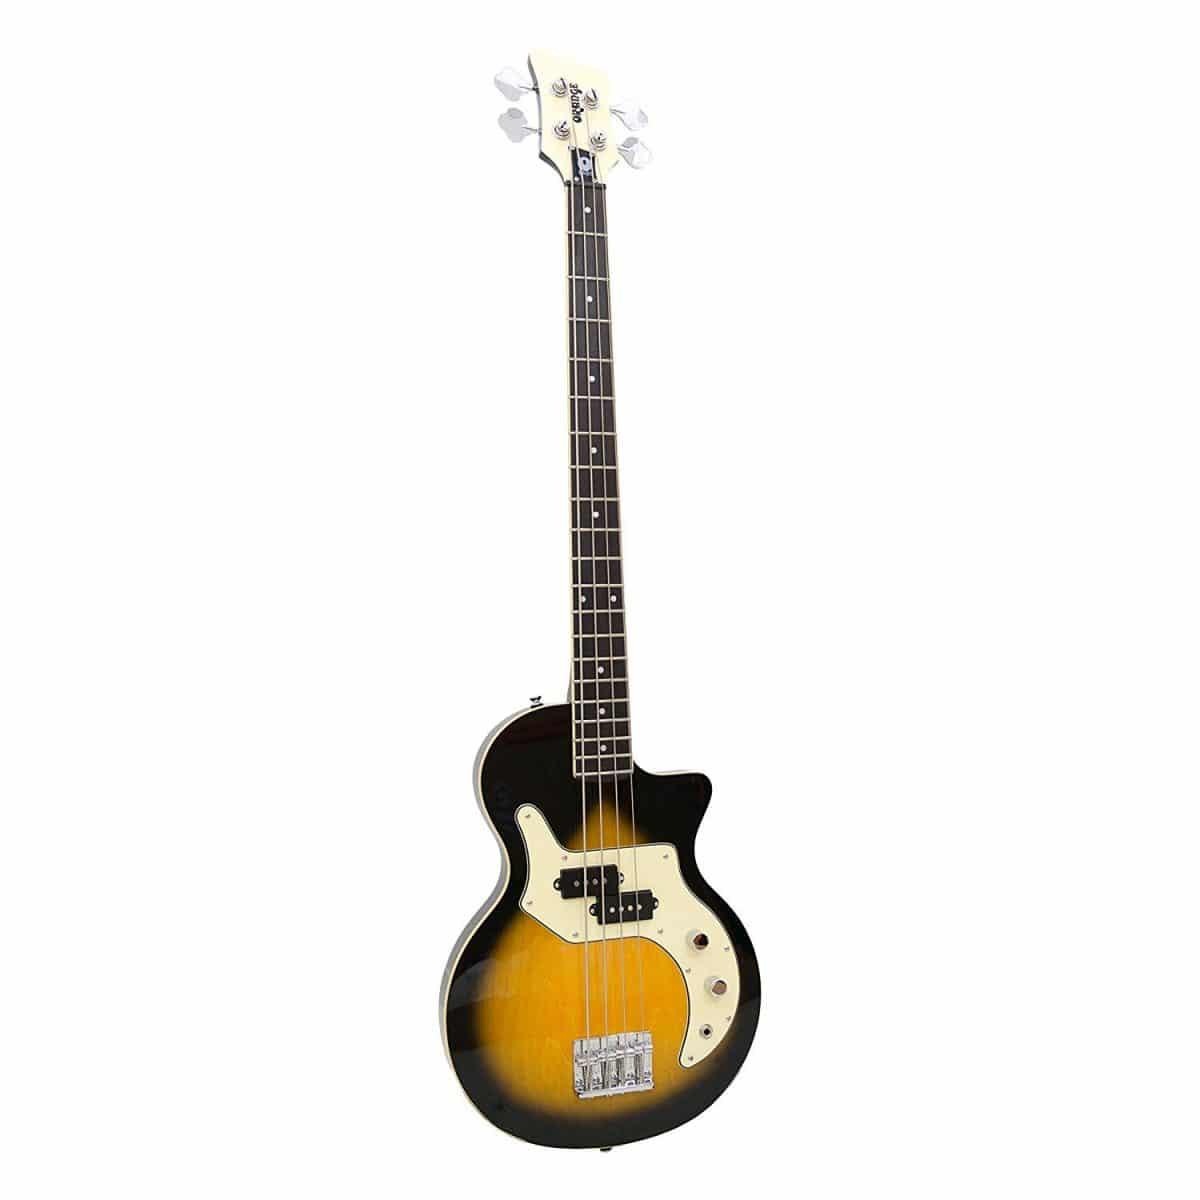 best cheap bass guitars 2019 under 500 1000 budgetreport. Black Bedroom Furniture Sets. Home Design Ideas